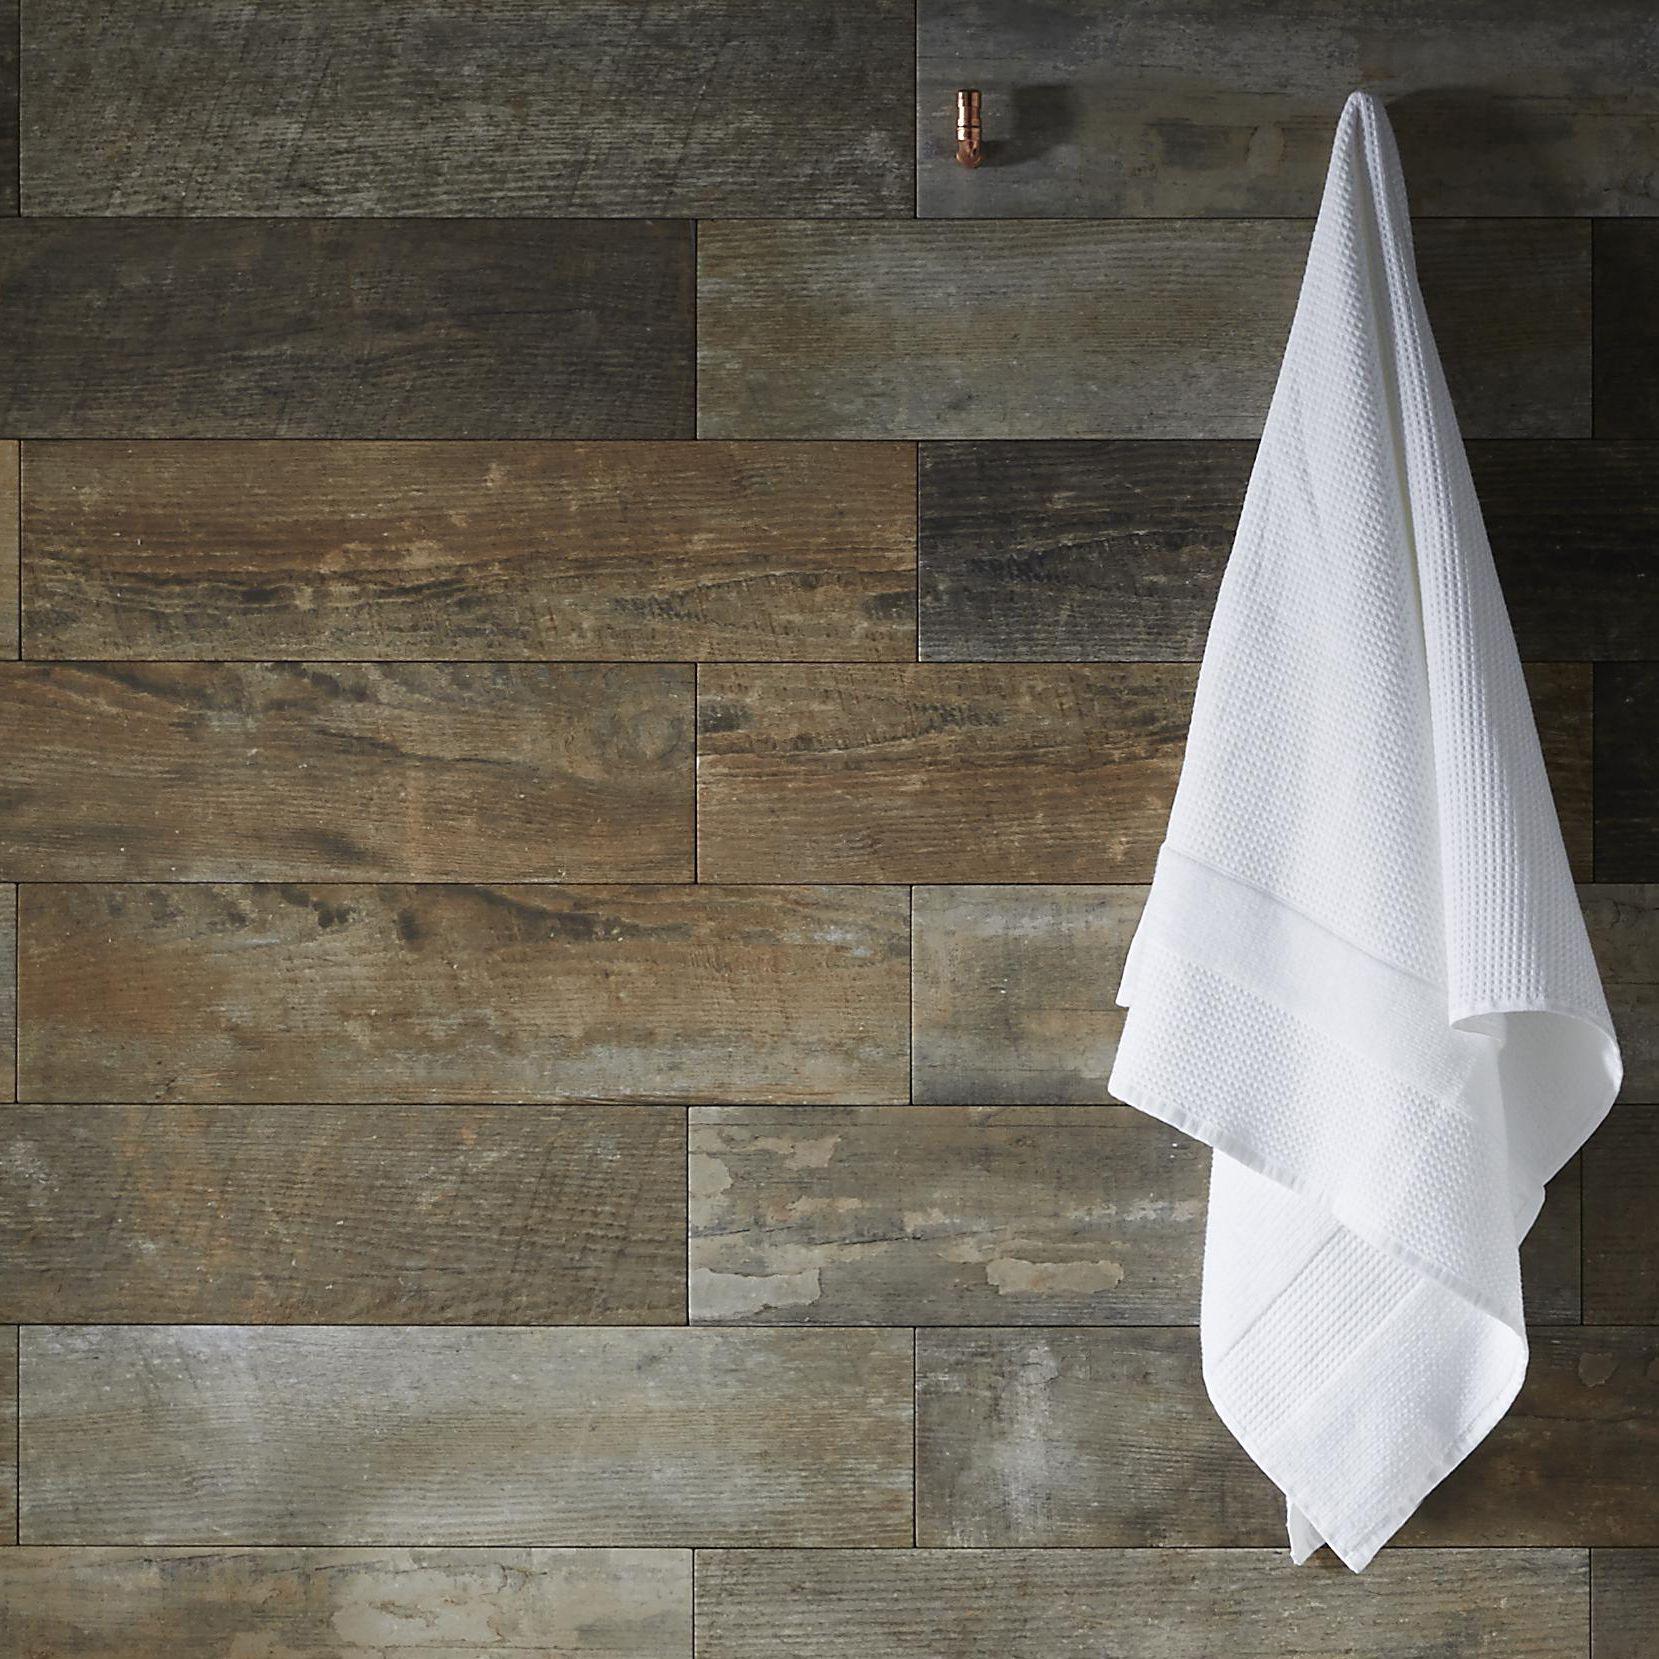 Savona Grey Natural Wood Effect Porcelain Wall Amp Floor